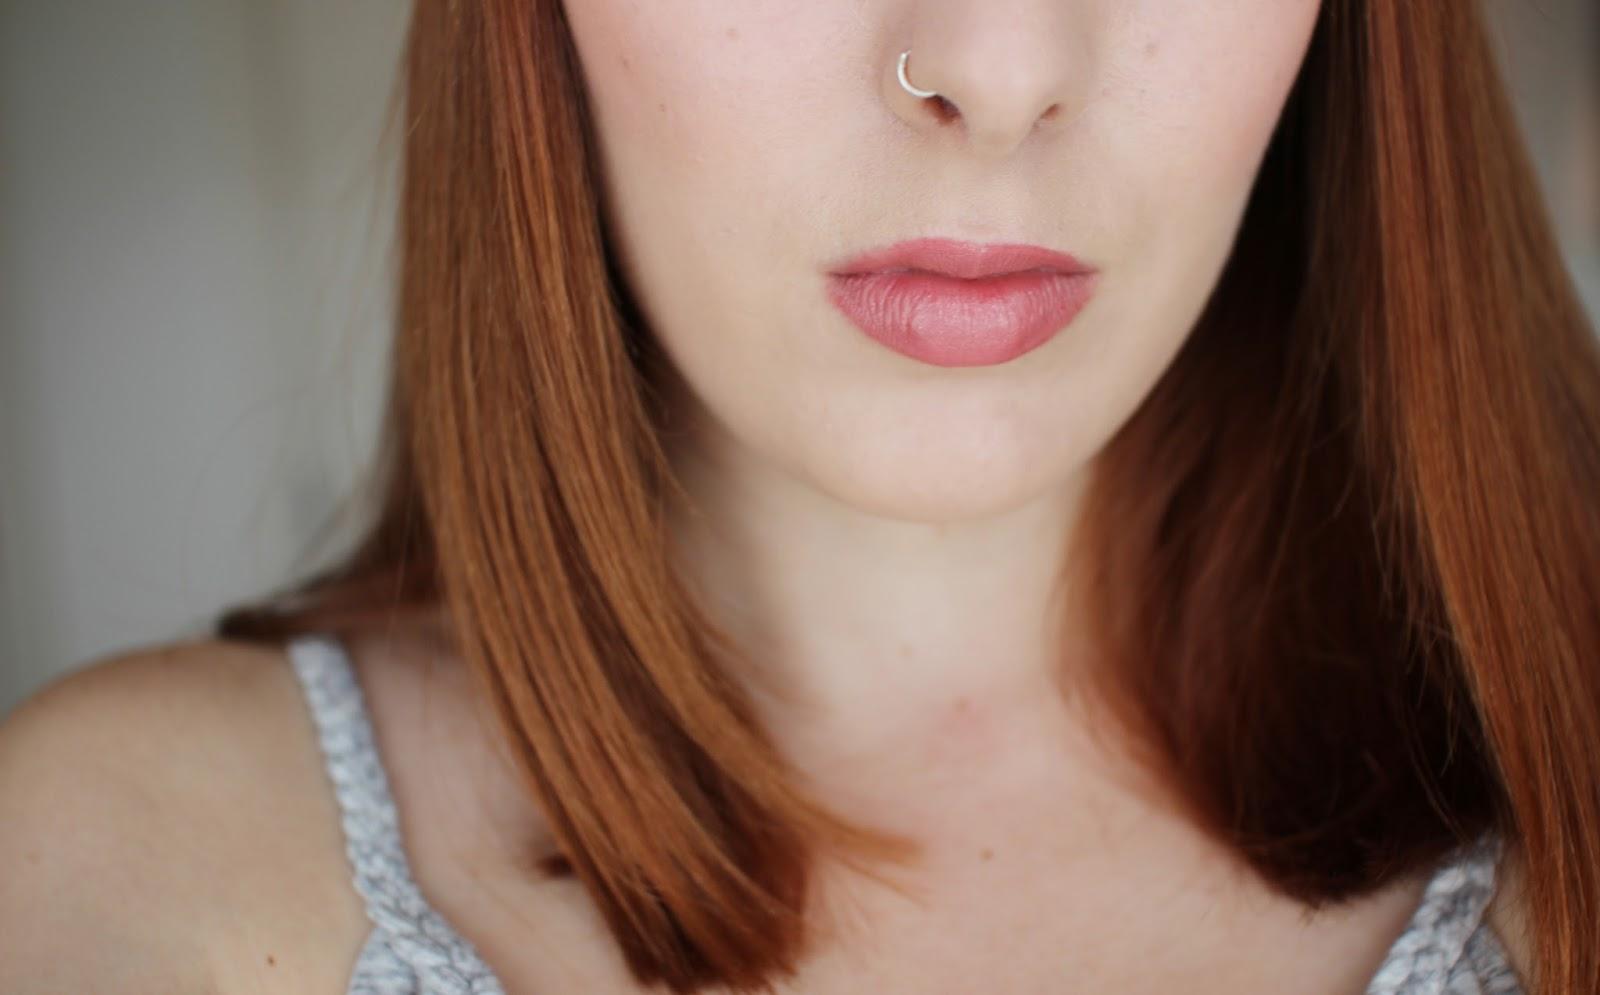 Betere MAC Peach Blossom Lipstick Review - Zoey Olivia OM-38